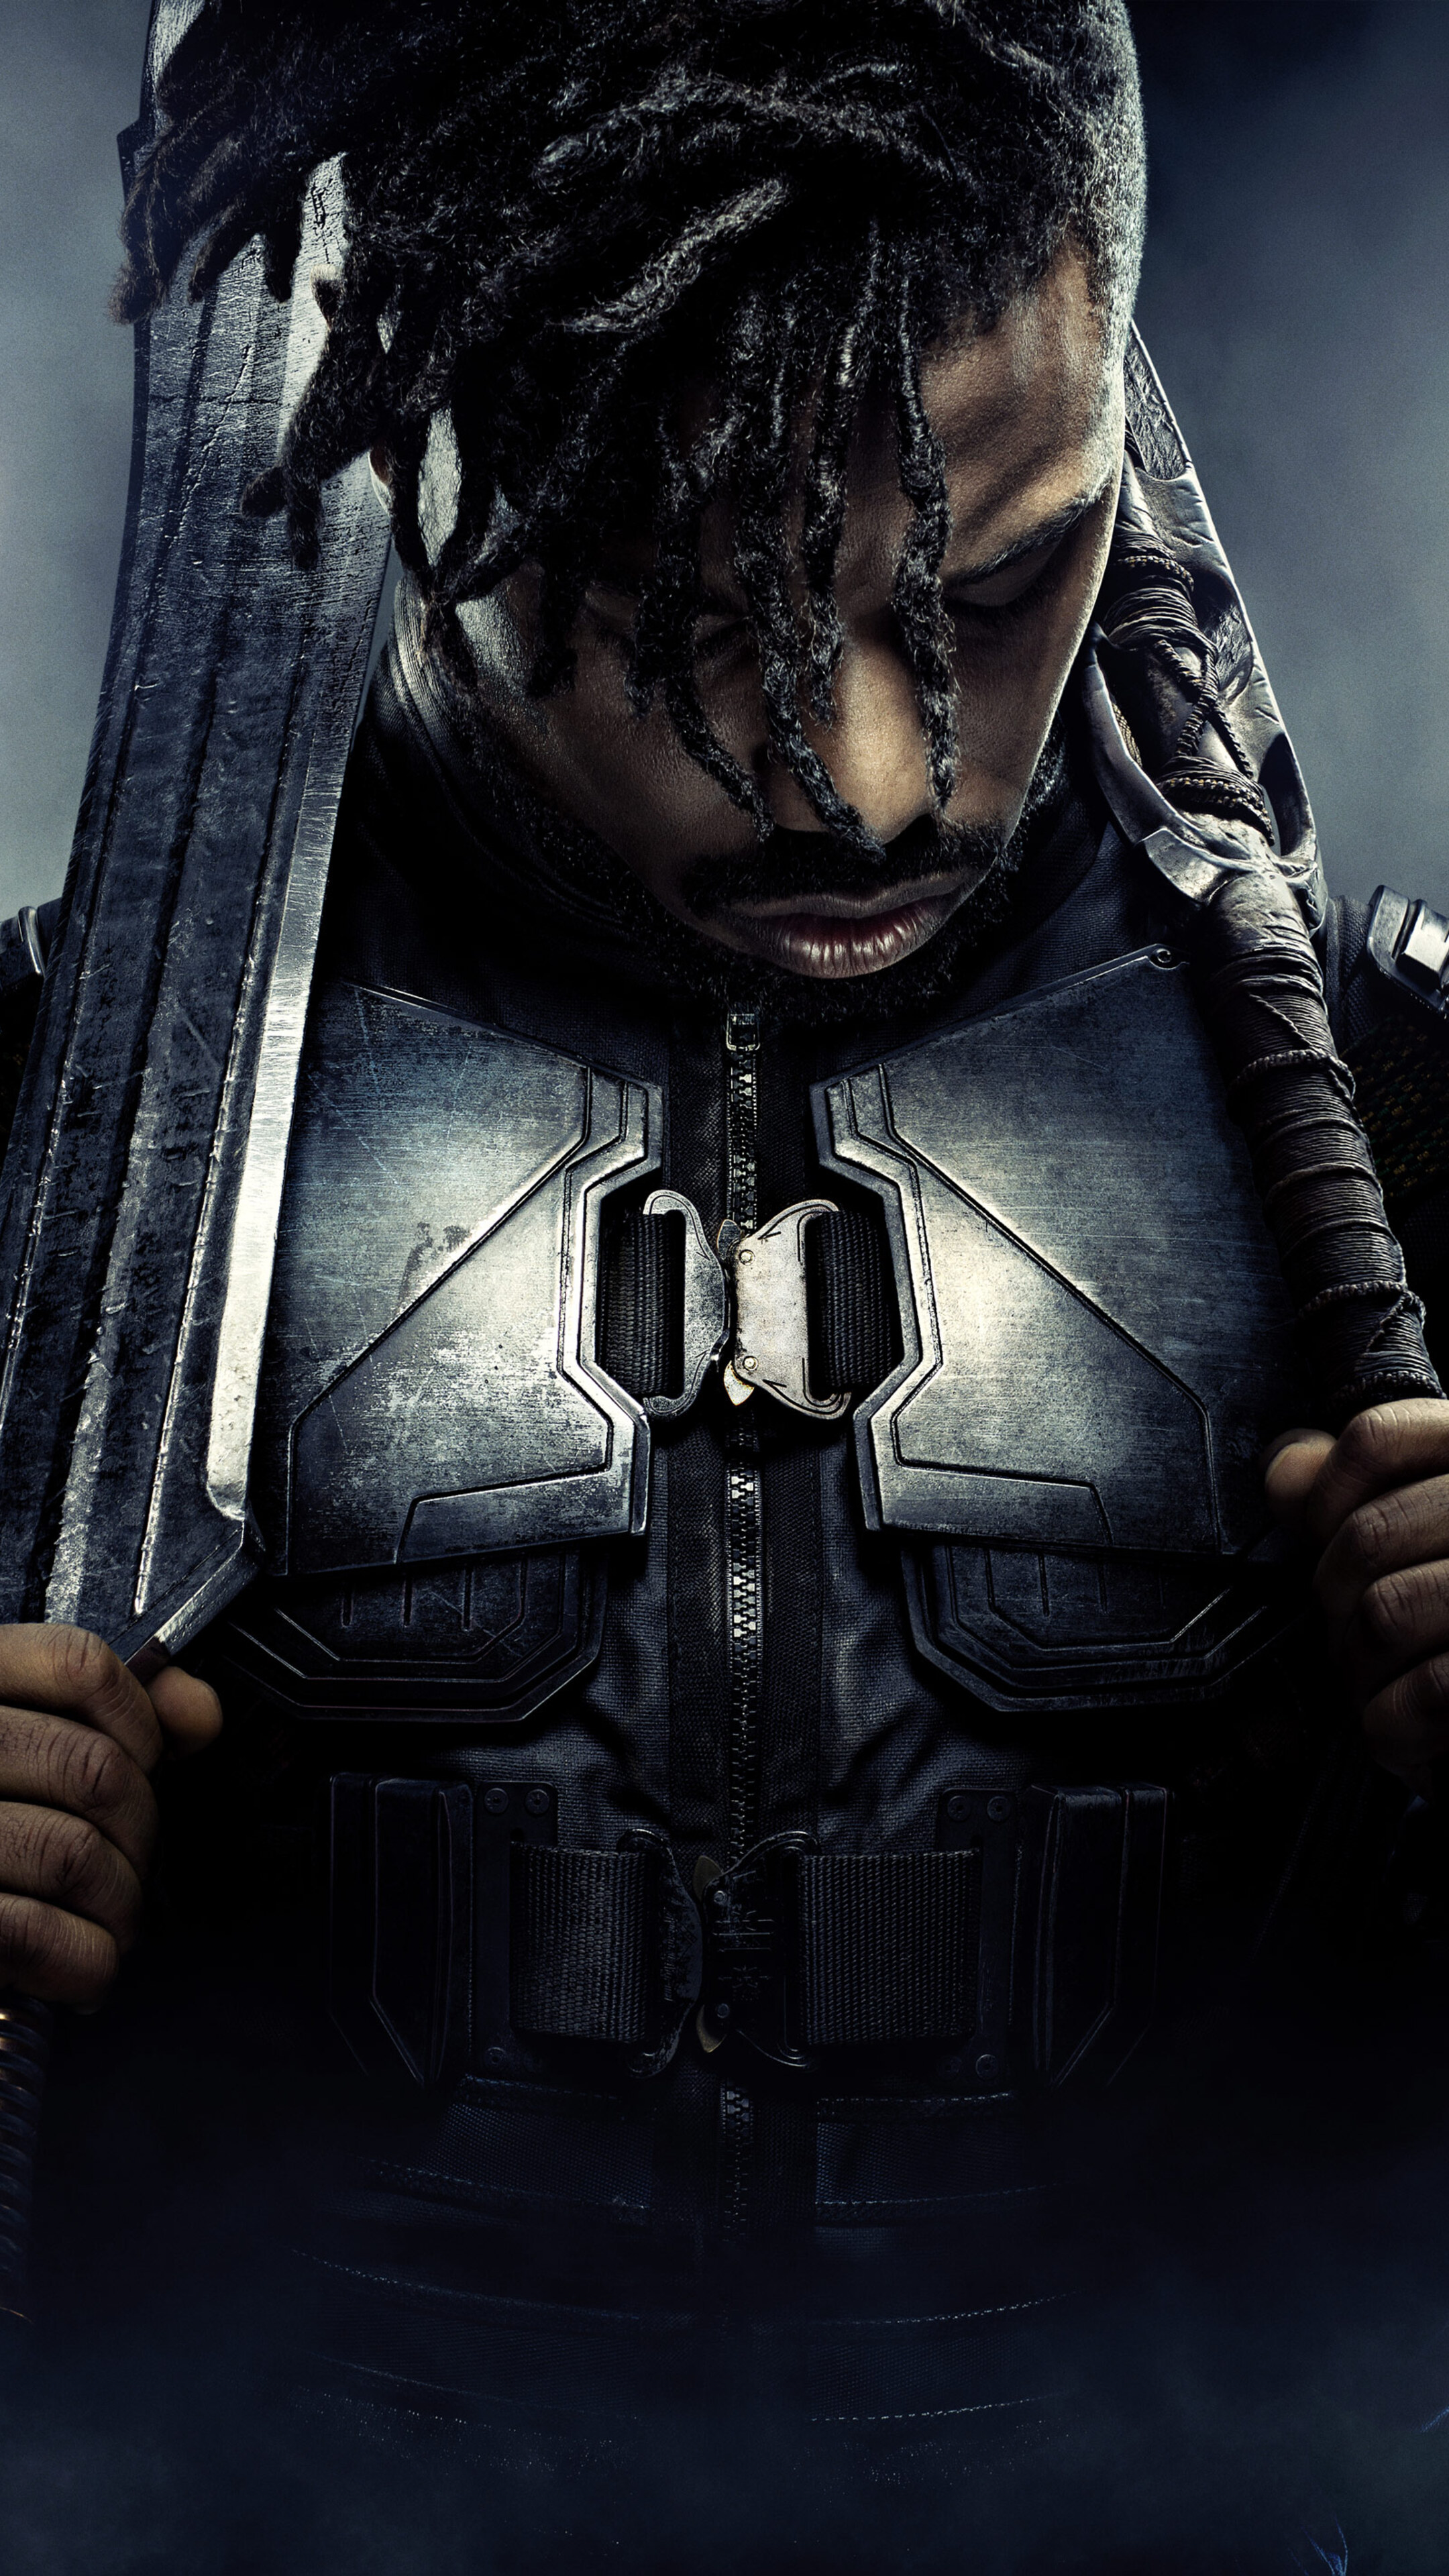 2160x3840 Michael B Jordan Black Panther Poster 4k 5k Sony Xperia X